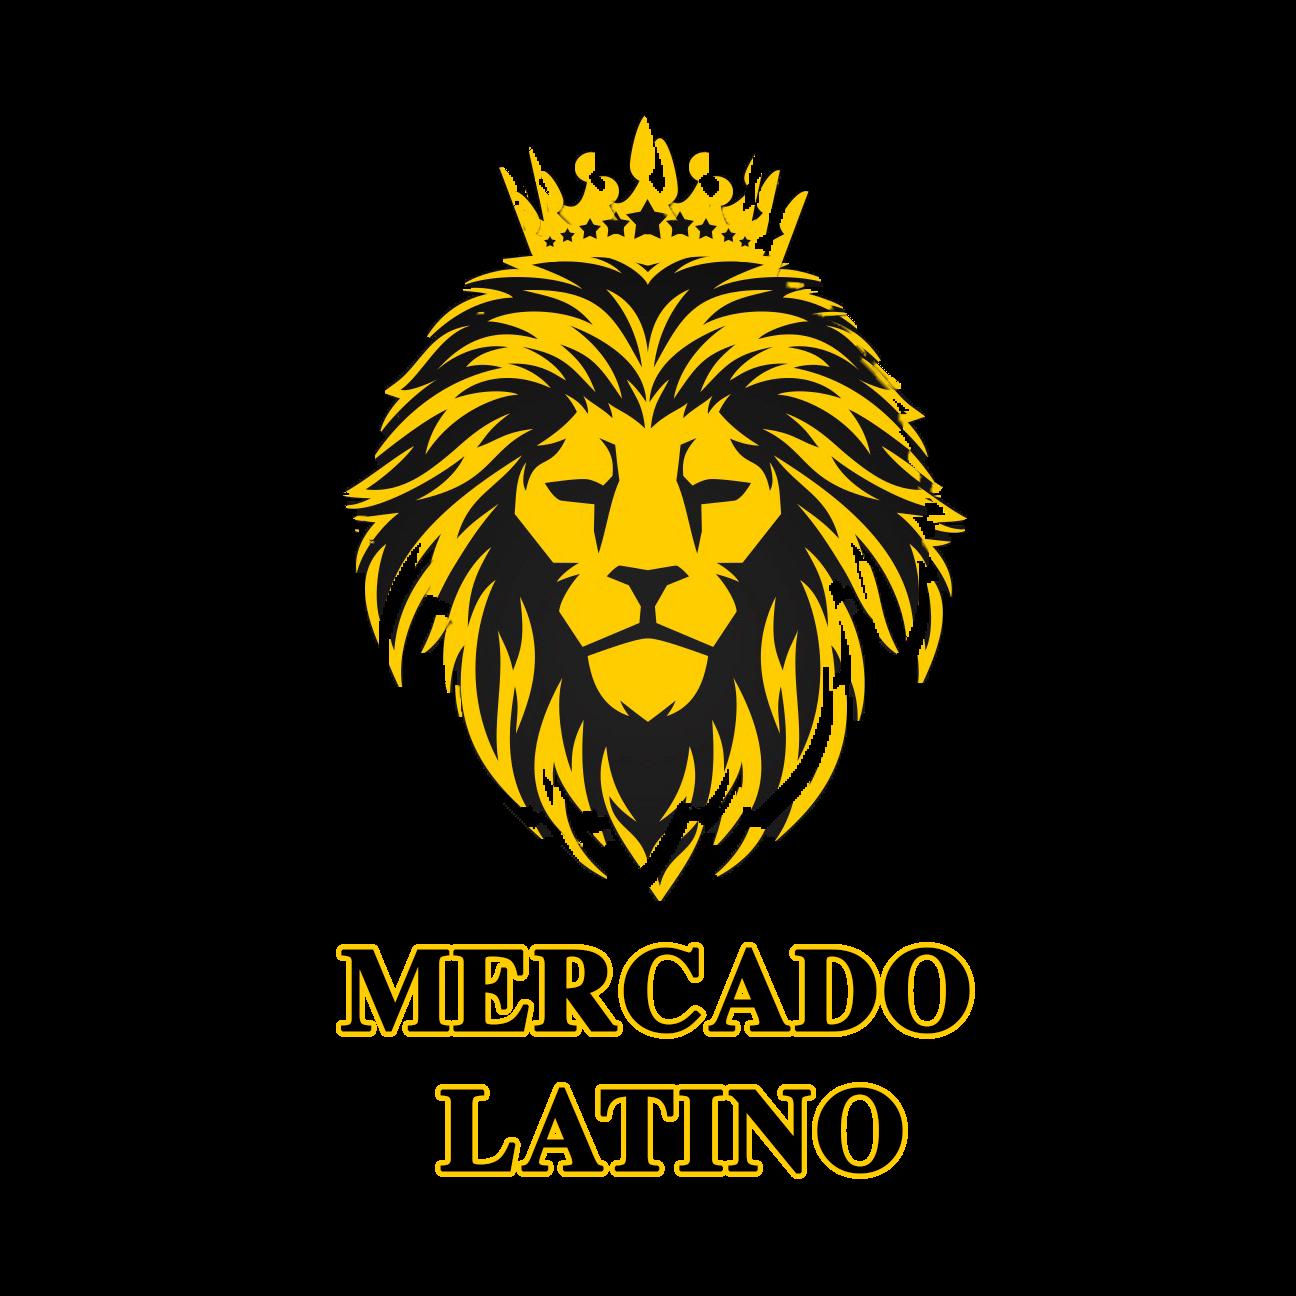 @mercadolatino Profile Image | Linktree